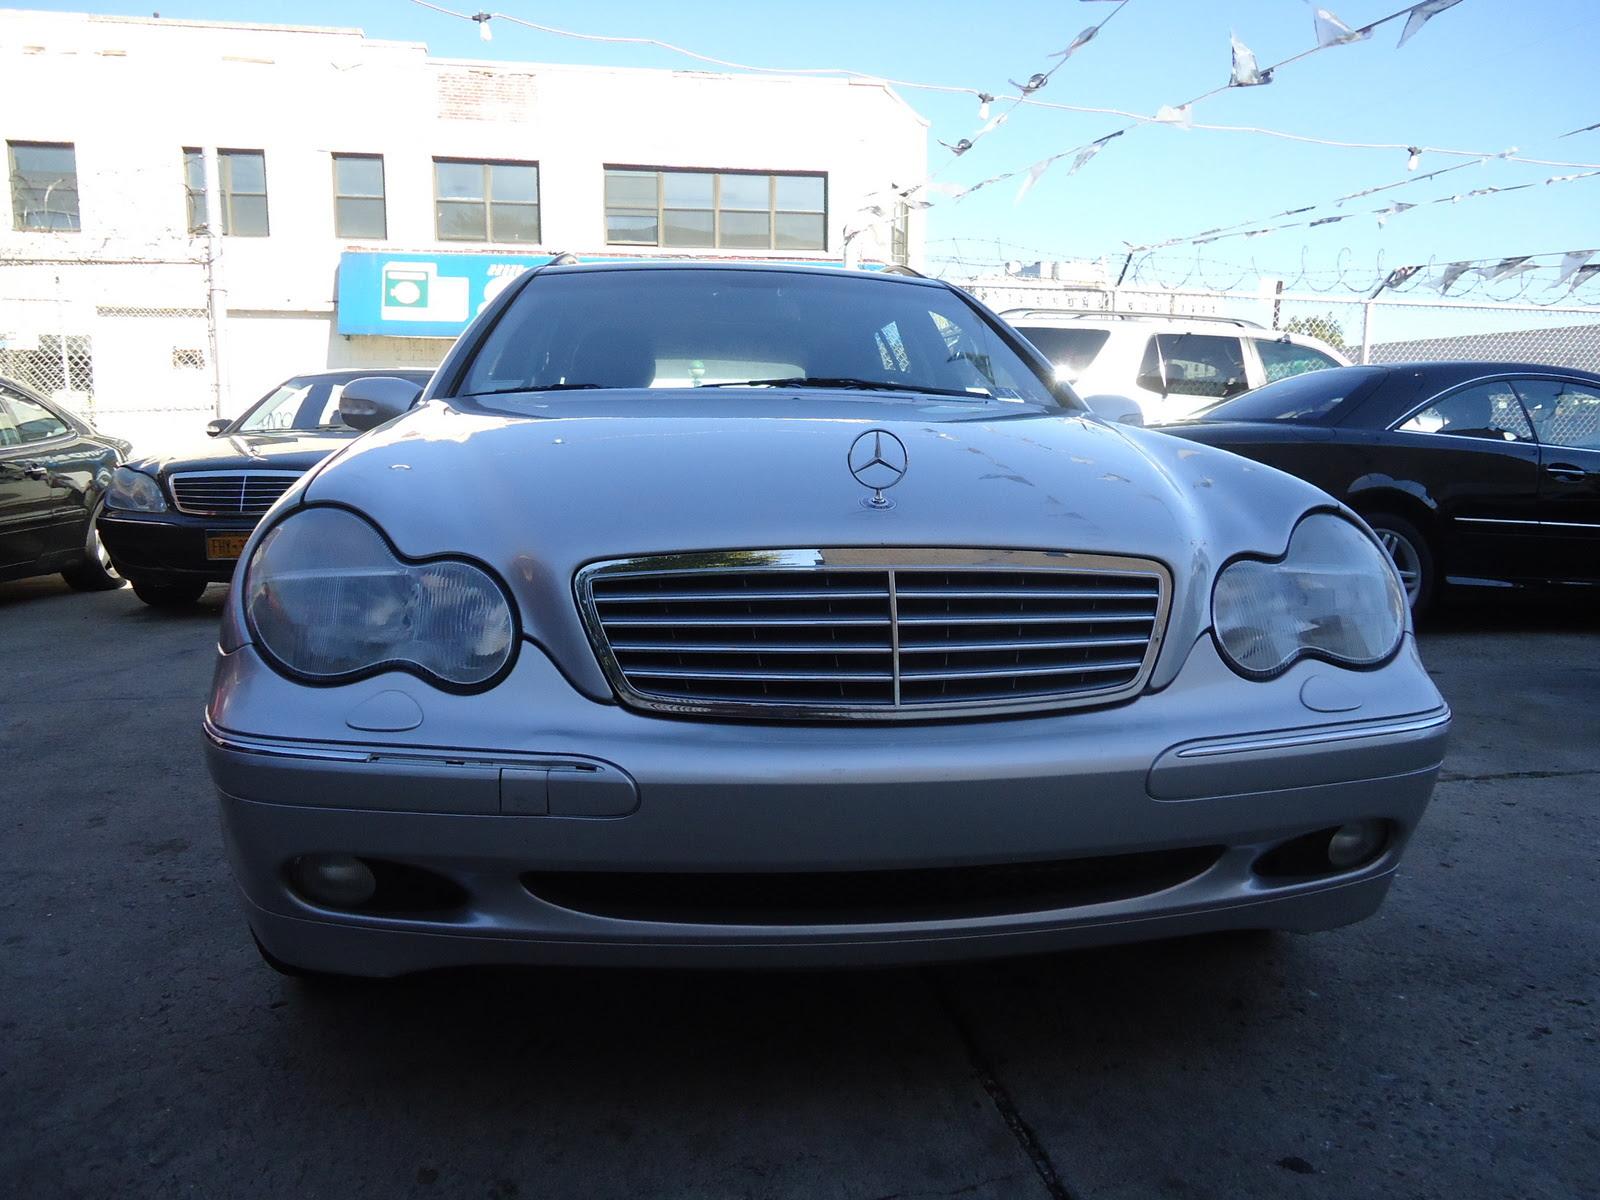 2002 Mercedes-Benz C-Class - Trim Information - CarGurus